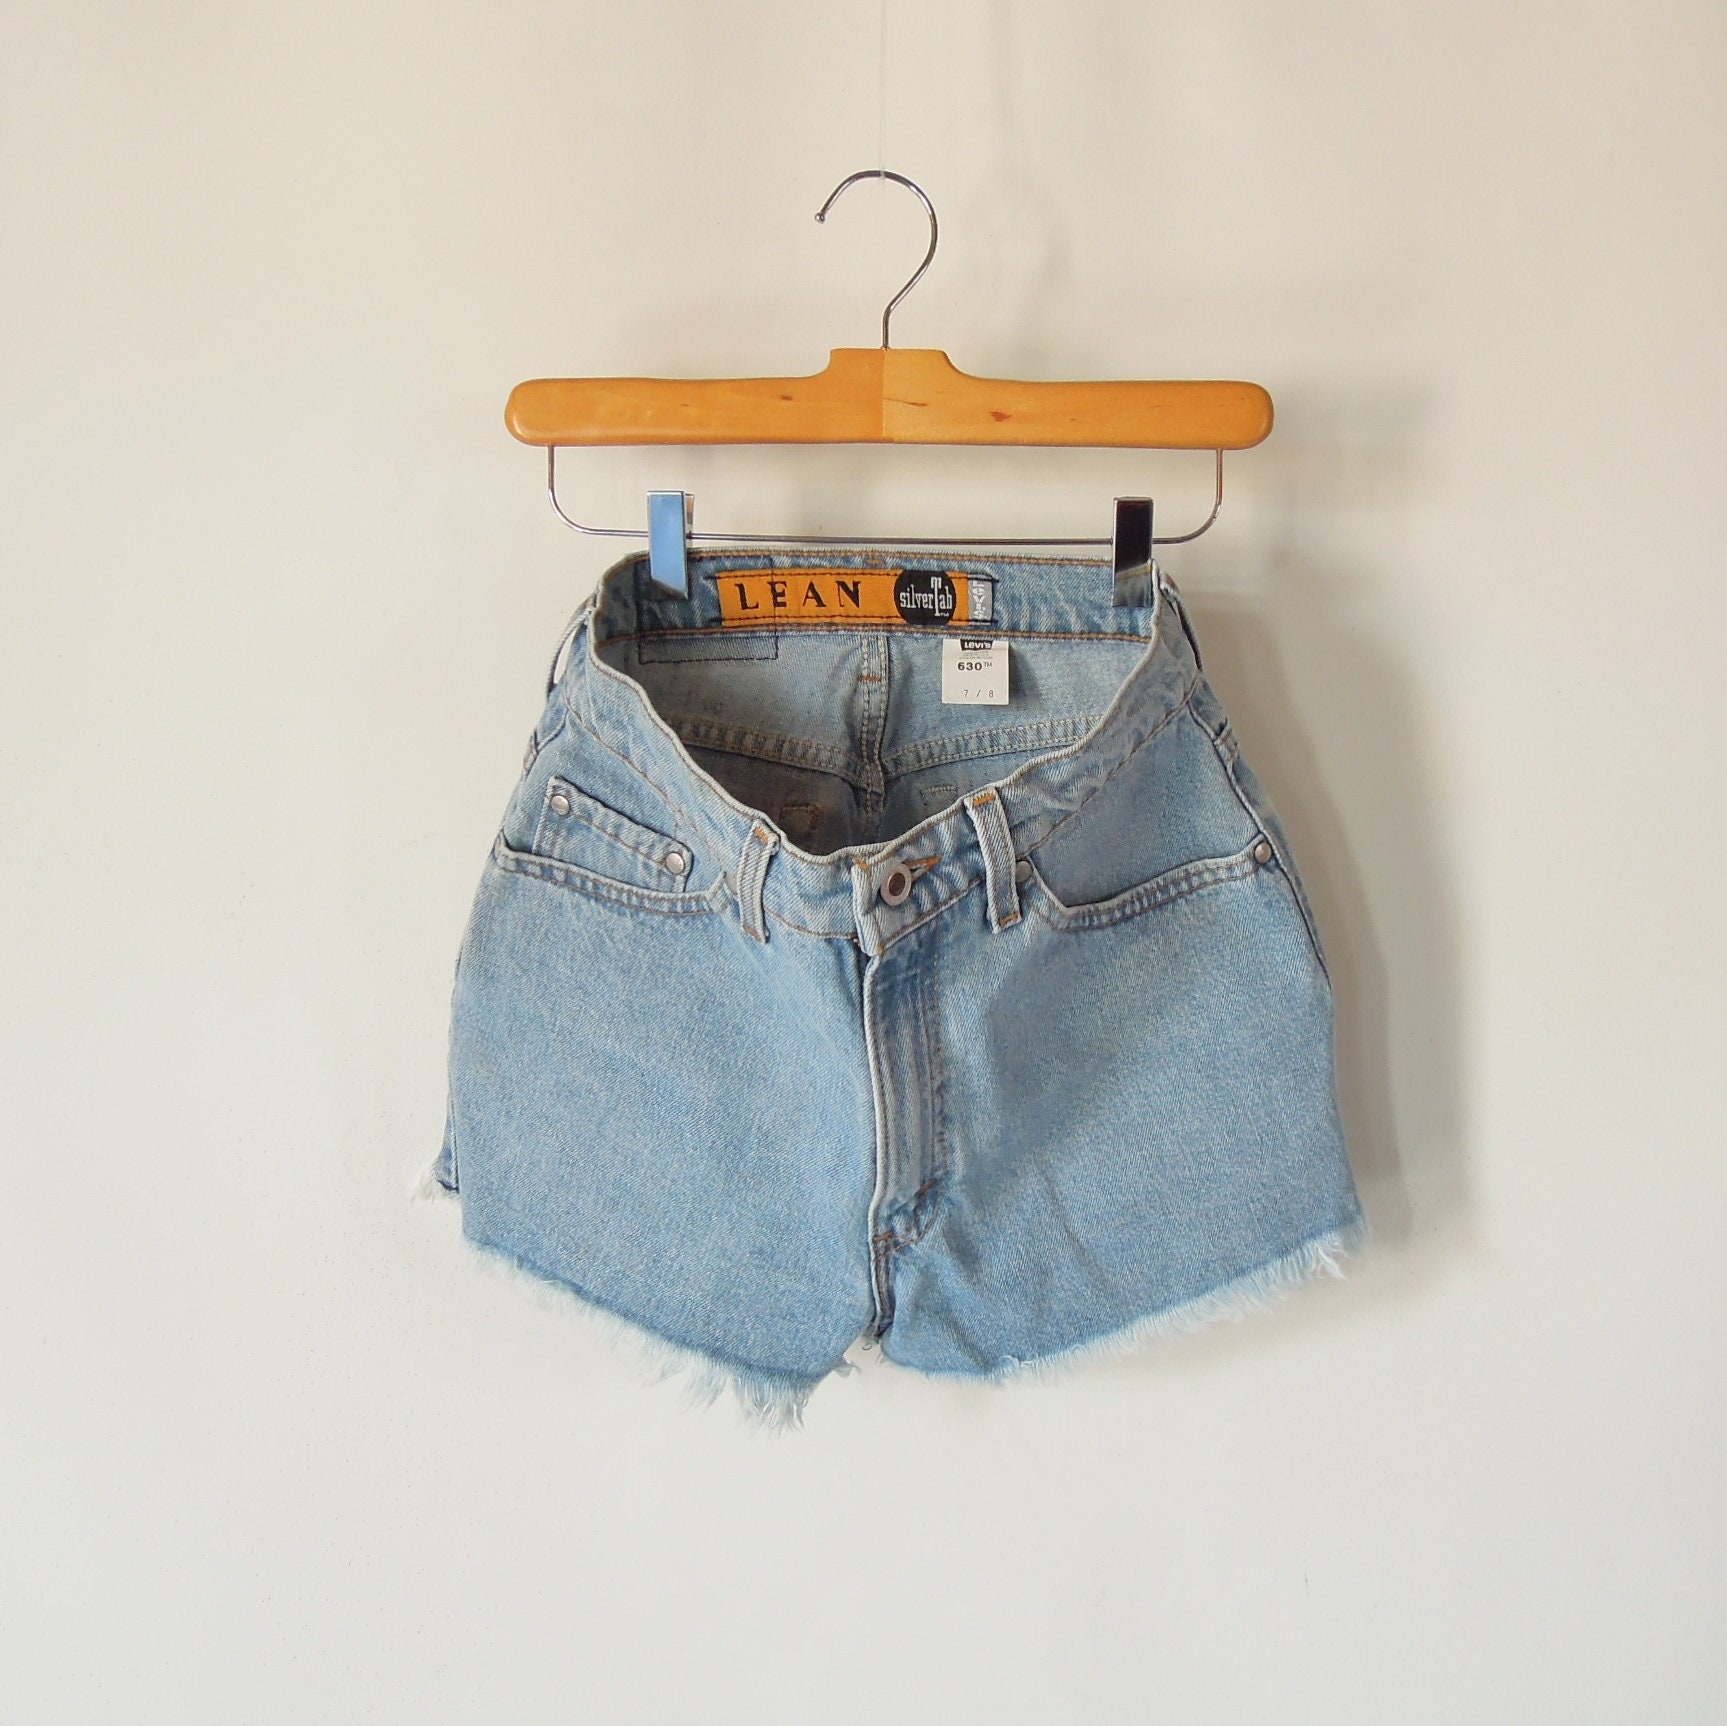 861b4d90 Frayed Denim Levi's Shorts High Waisted 90' era   Etsy